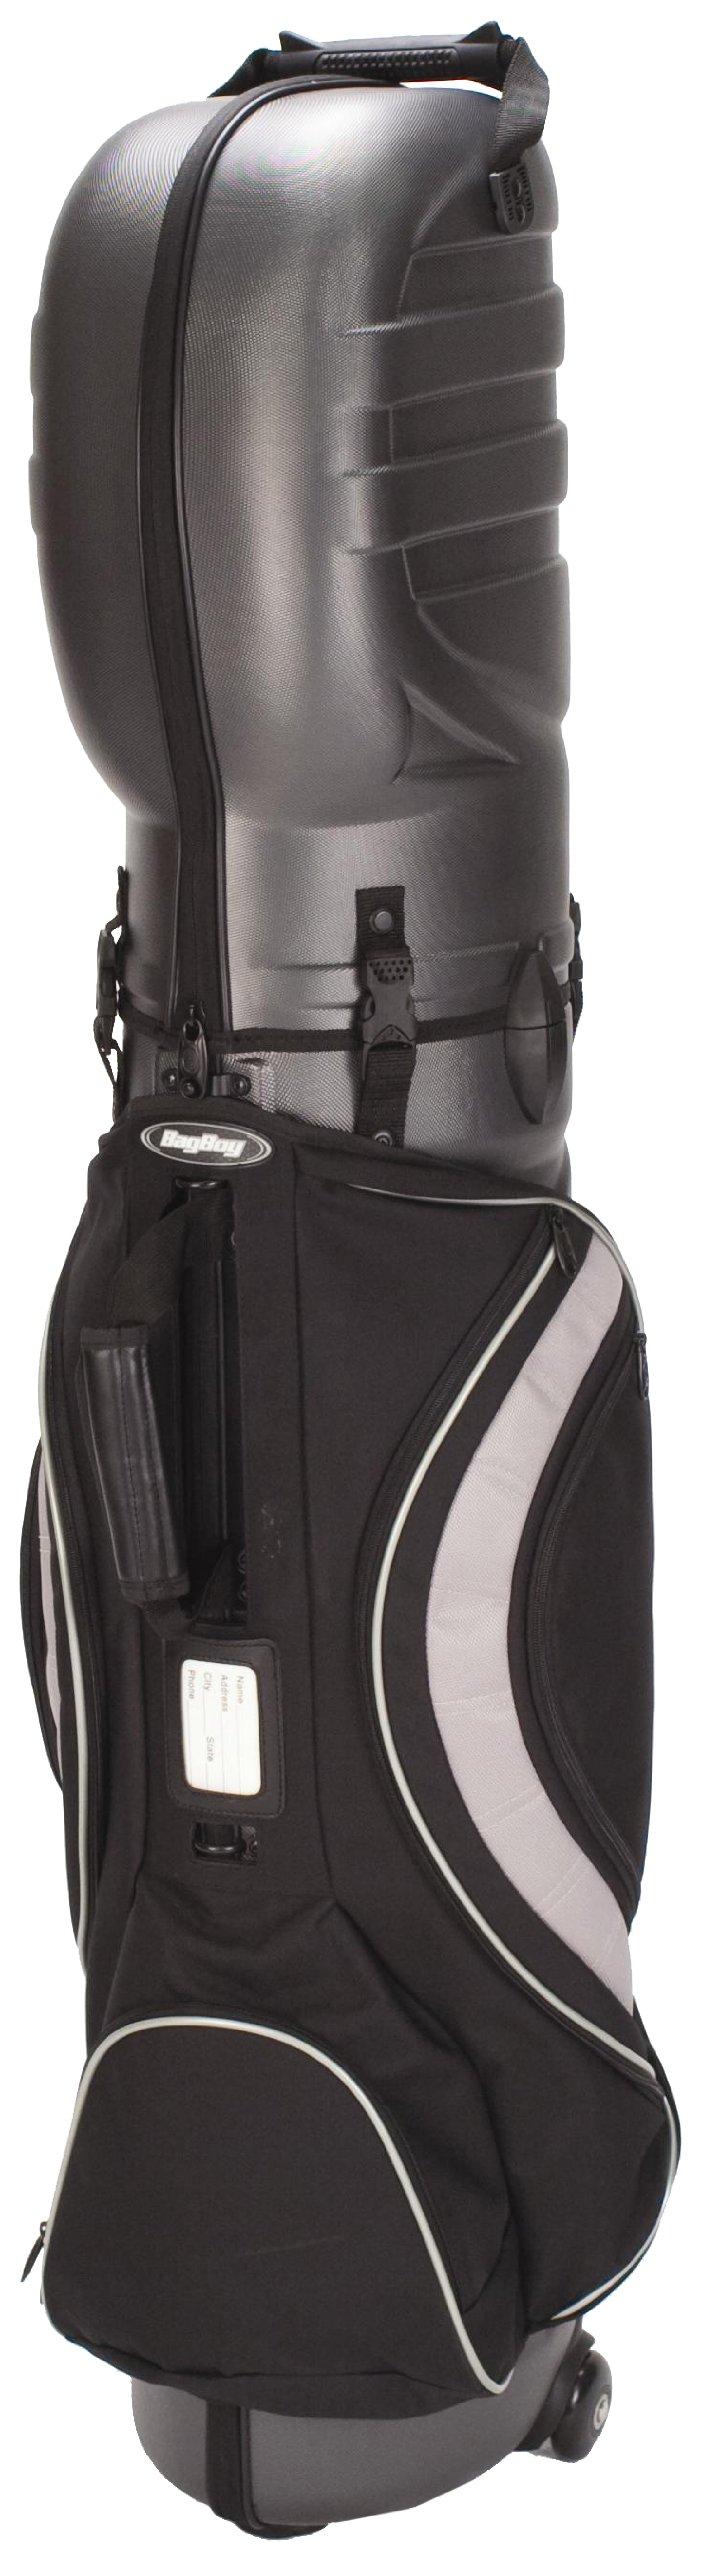 Bag Boy Hybrid TC Travel Cover